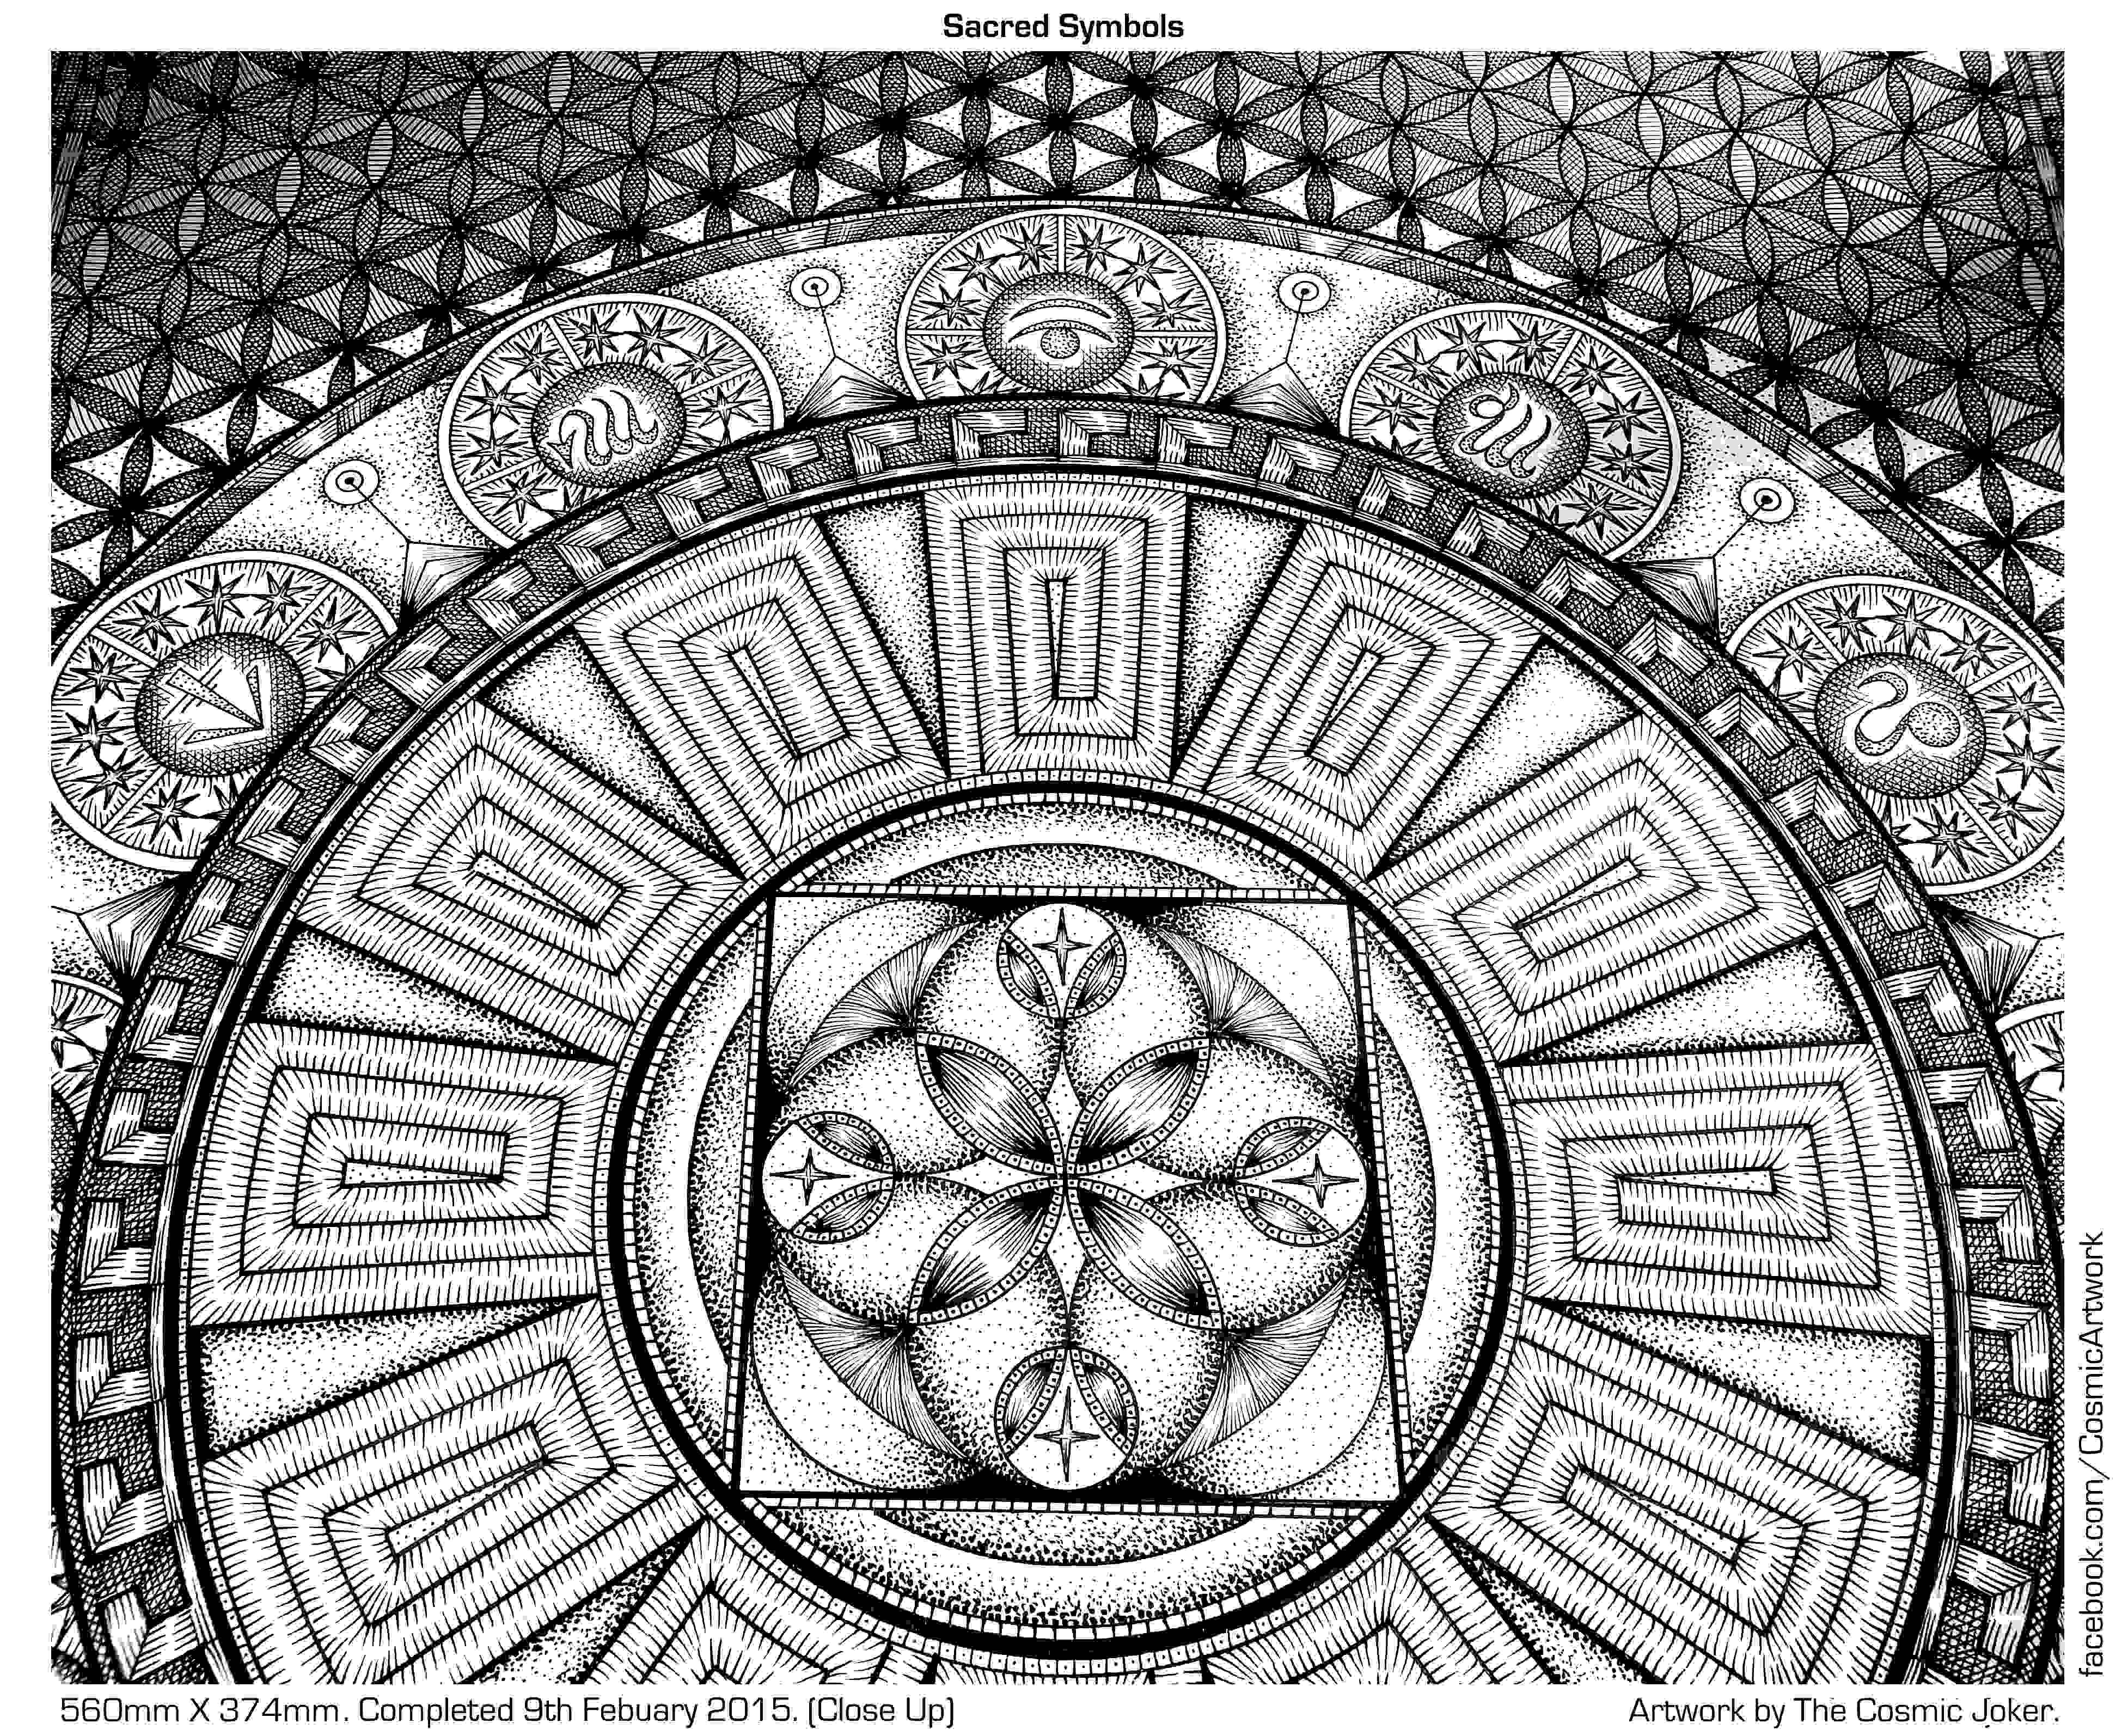 New artwork sacred symbols the art of affecting consciousness sacred symbols biocorpaavc